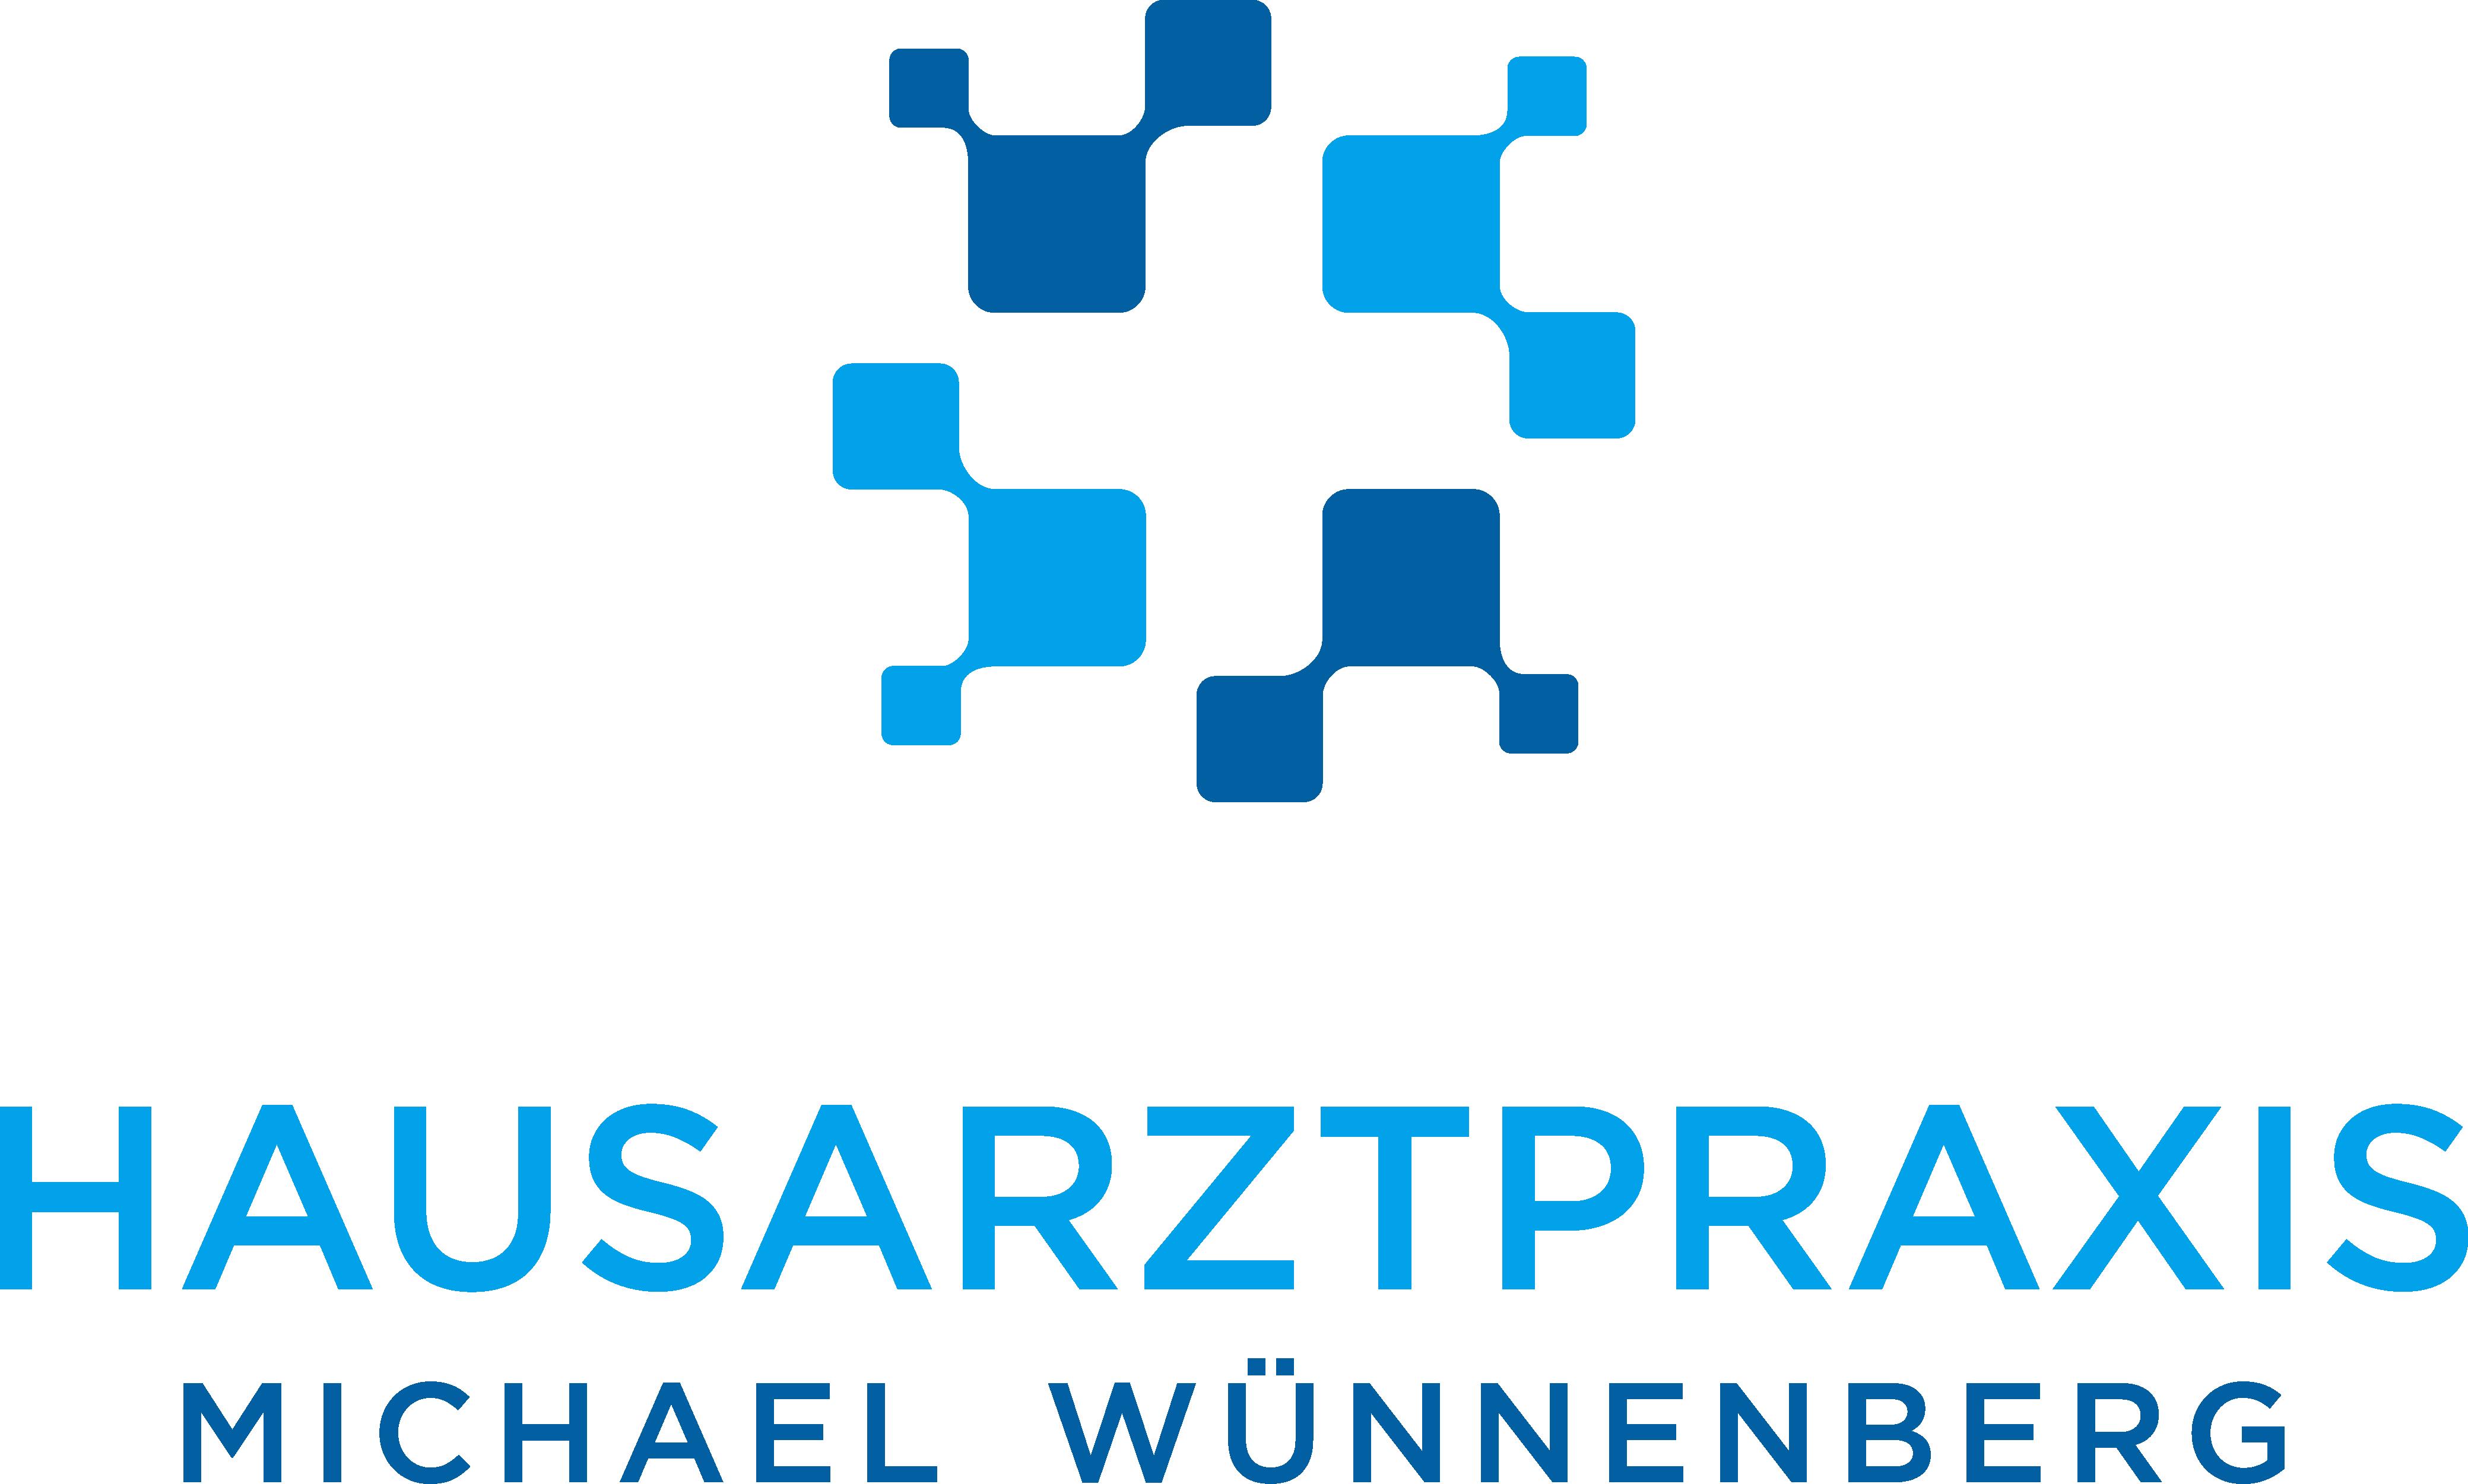 Hausarztpraxis Wünneberg